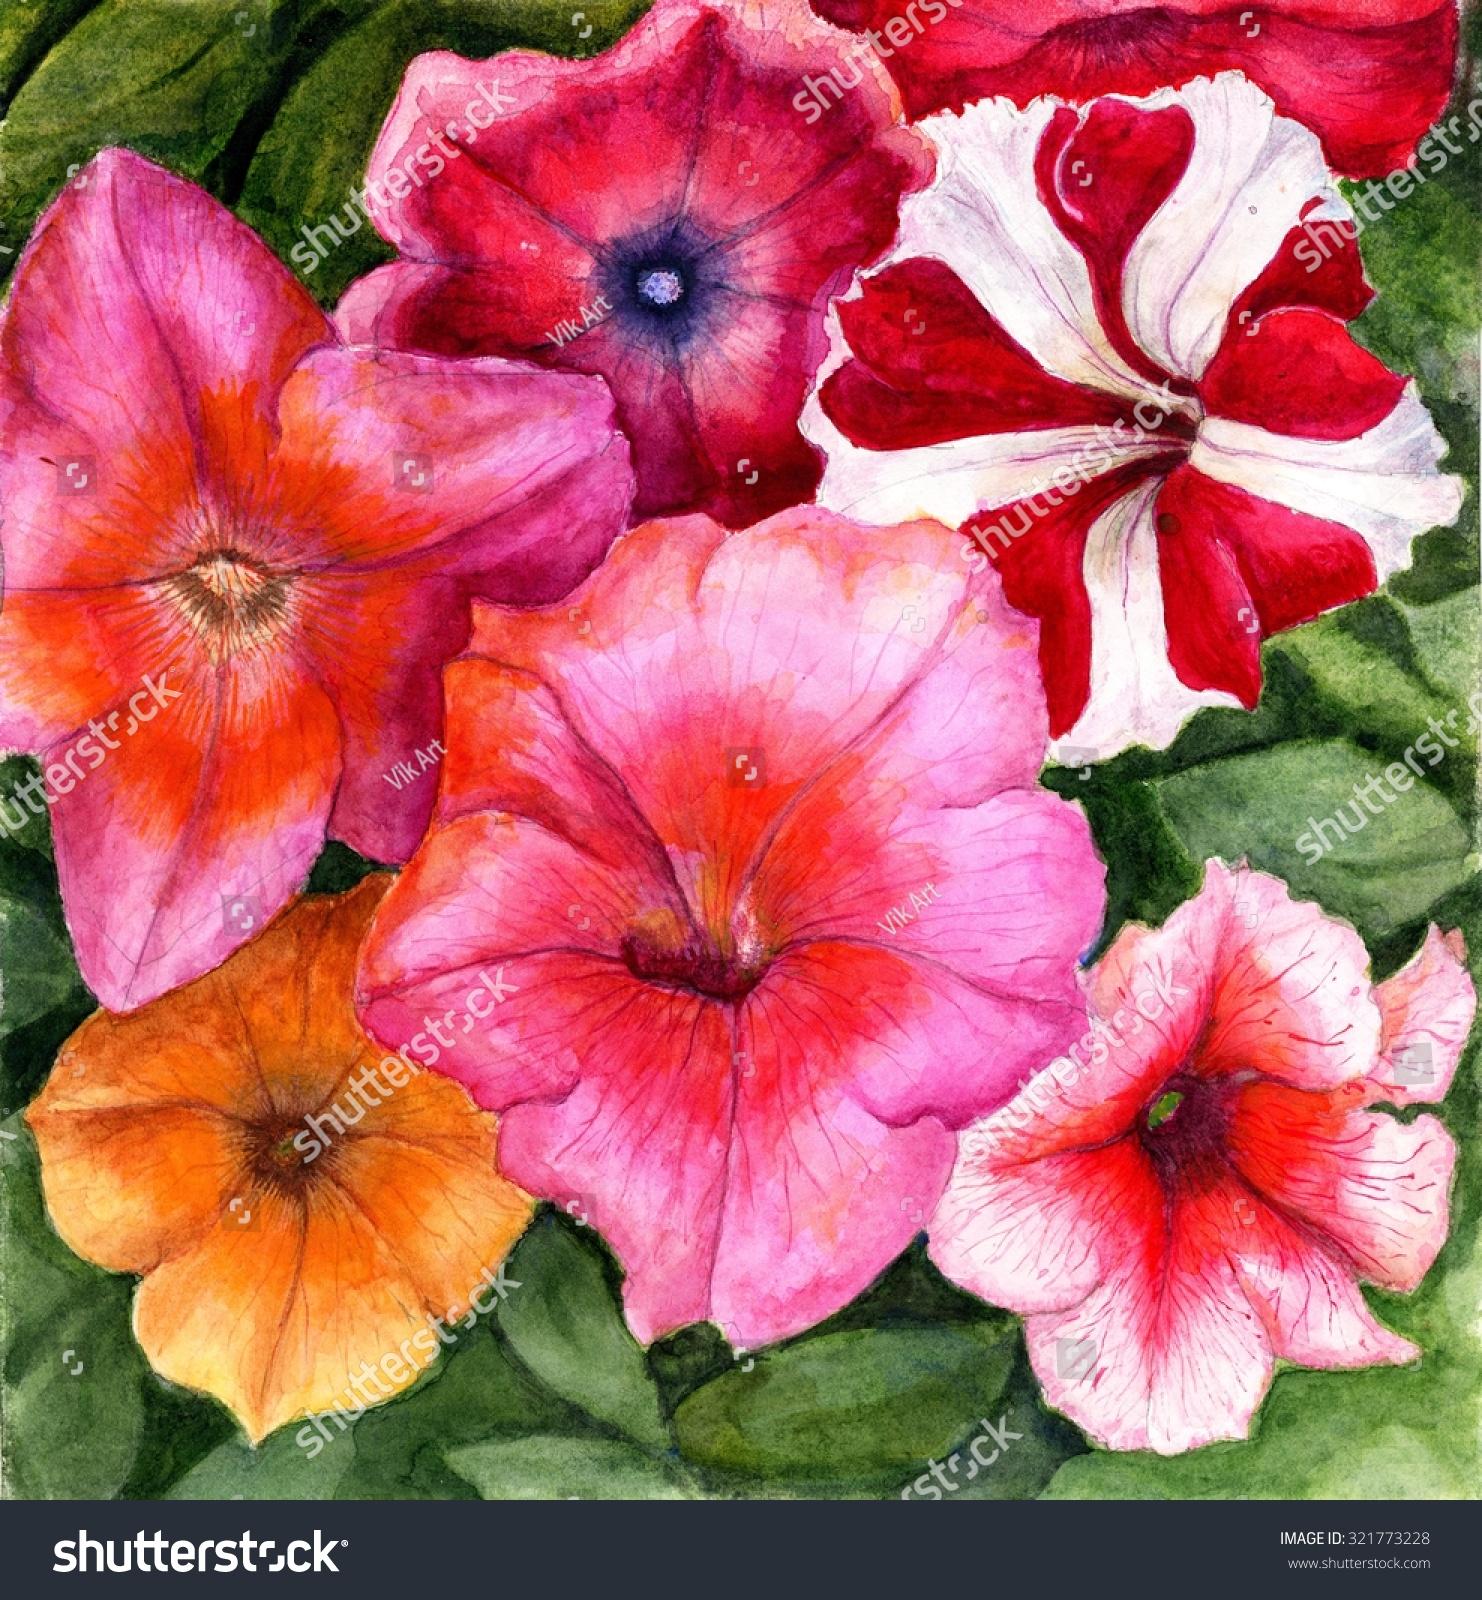 Watercolor painting beautiful flowers stock illustration 321773228 watercolor painting of the beautiful flowers izmirmasajfo